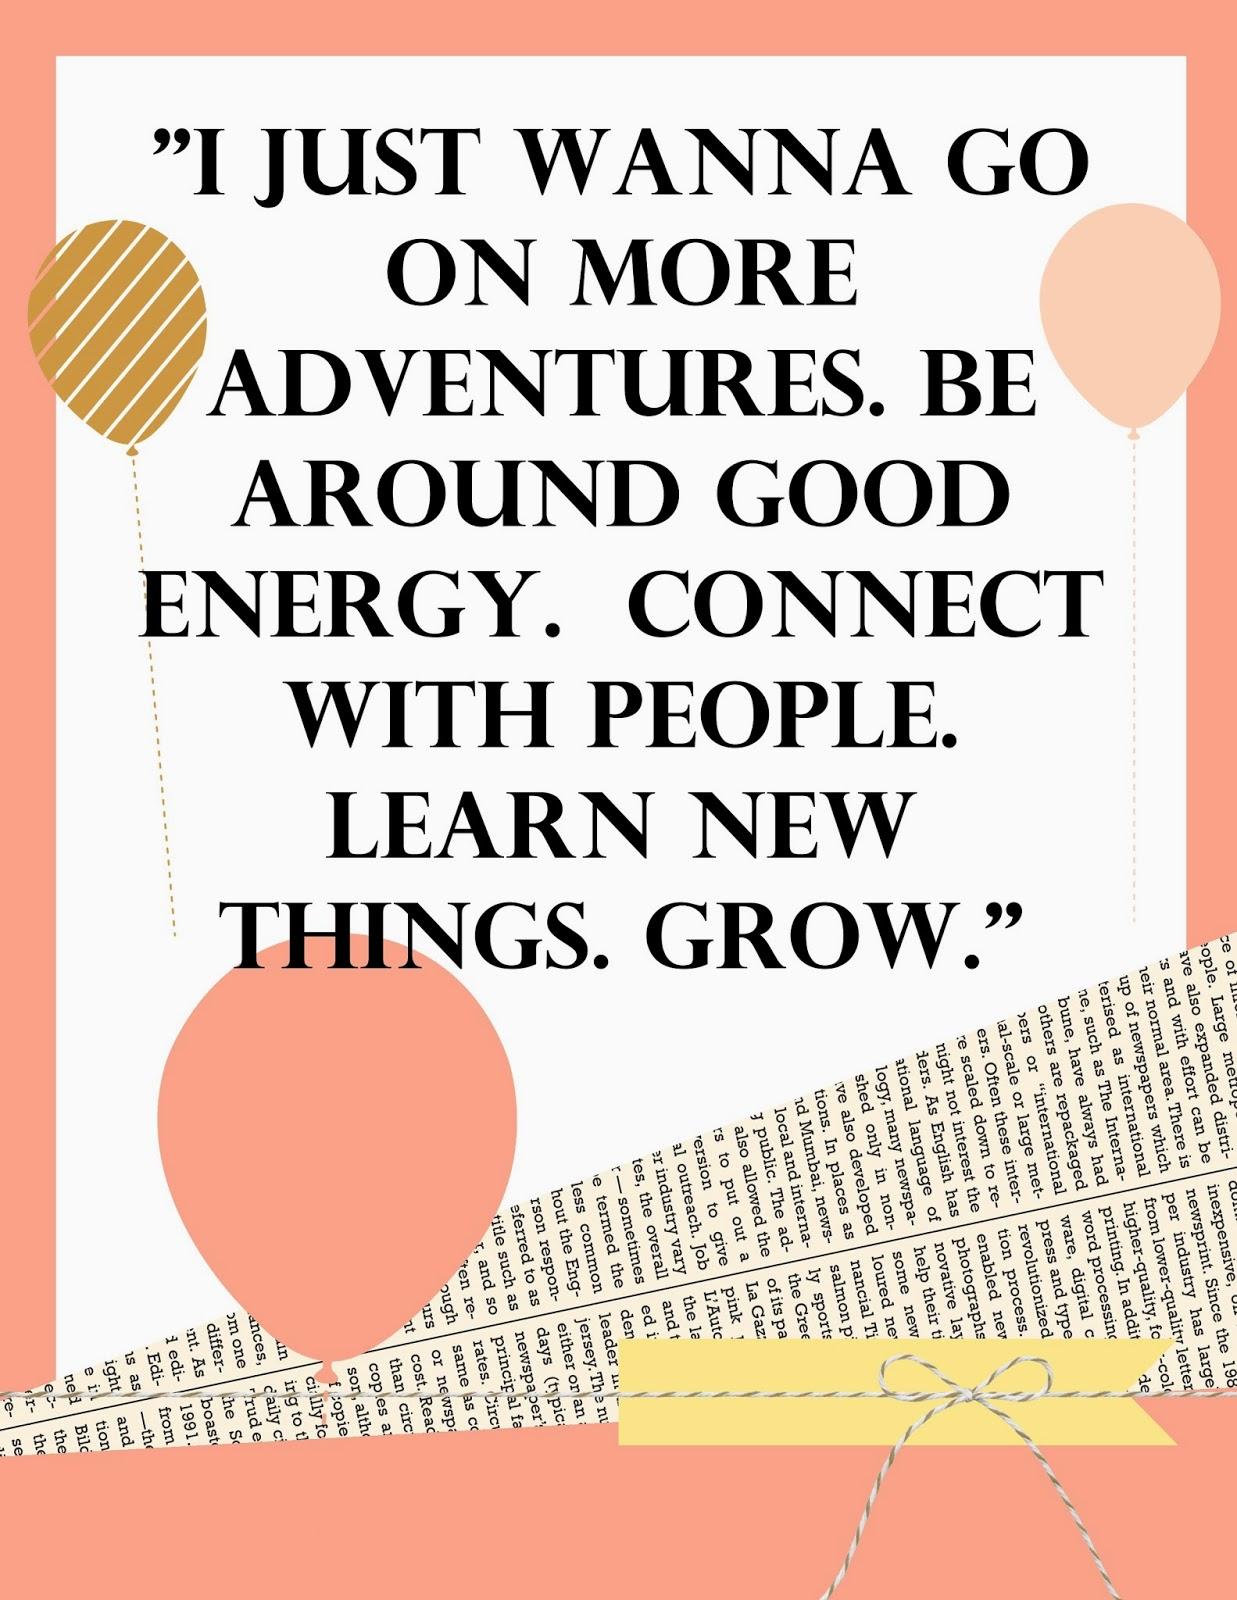 adventures, energy, good, people, learn, new, grow